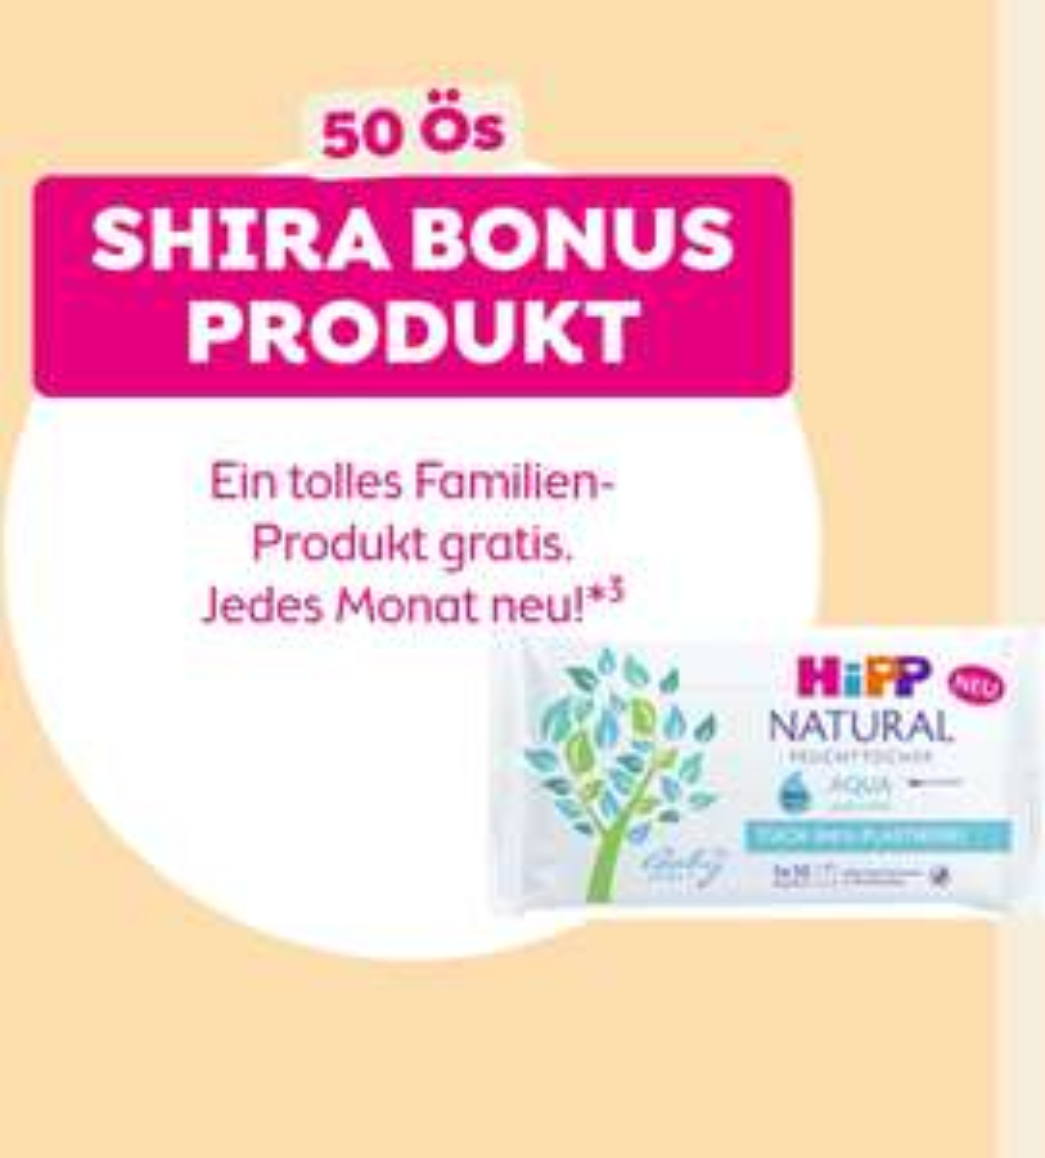 BIPA - Bonusprodukt Family - Juni 2021 für 50 JÖ Punkte